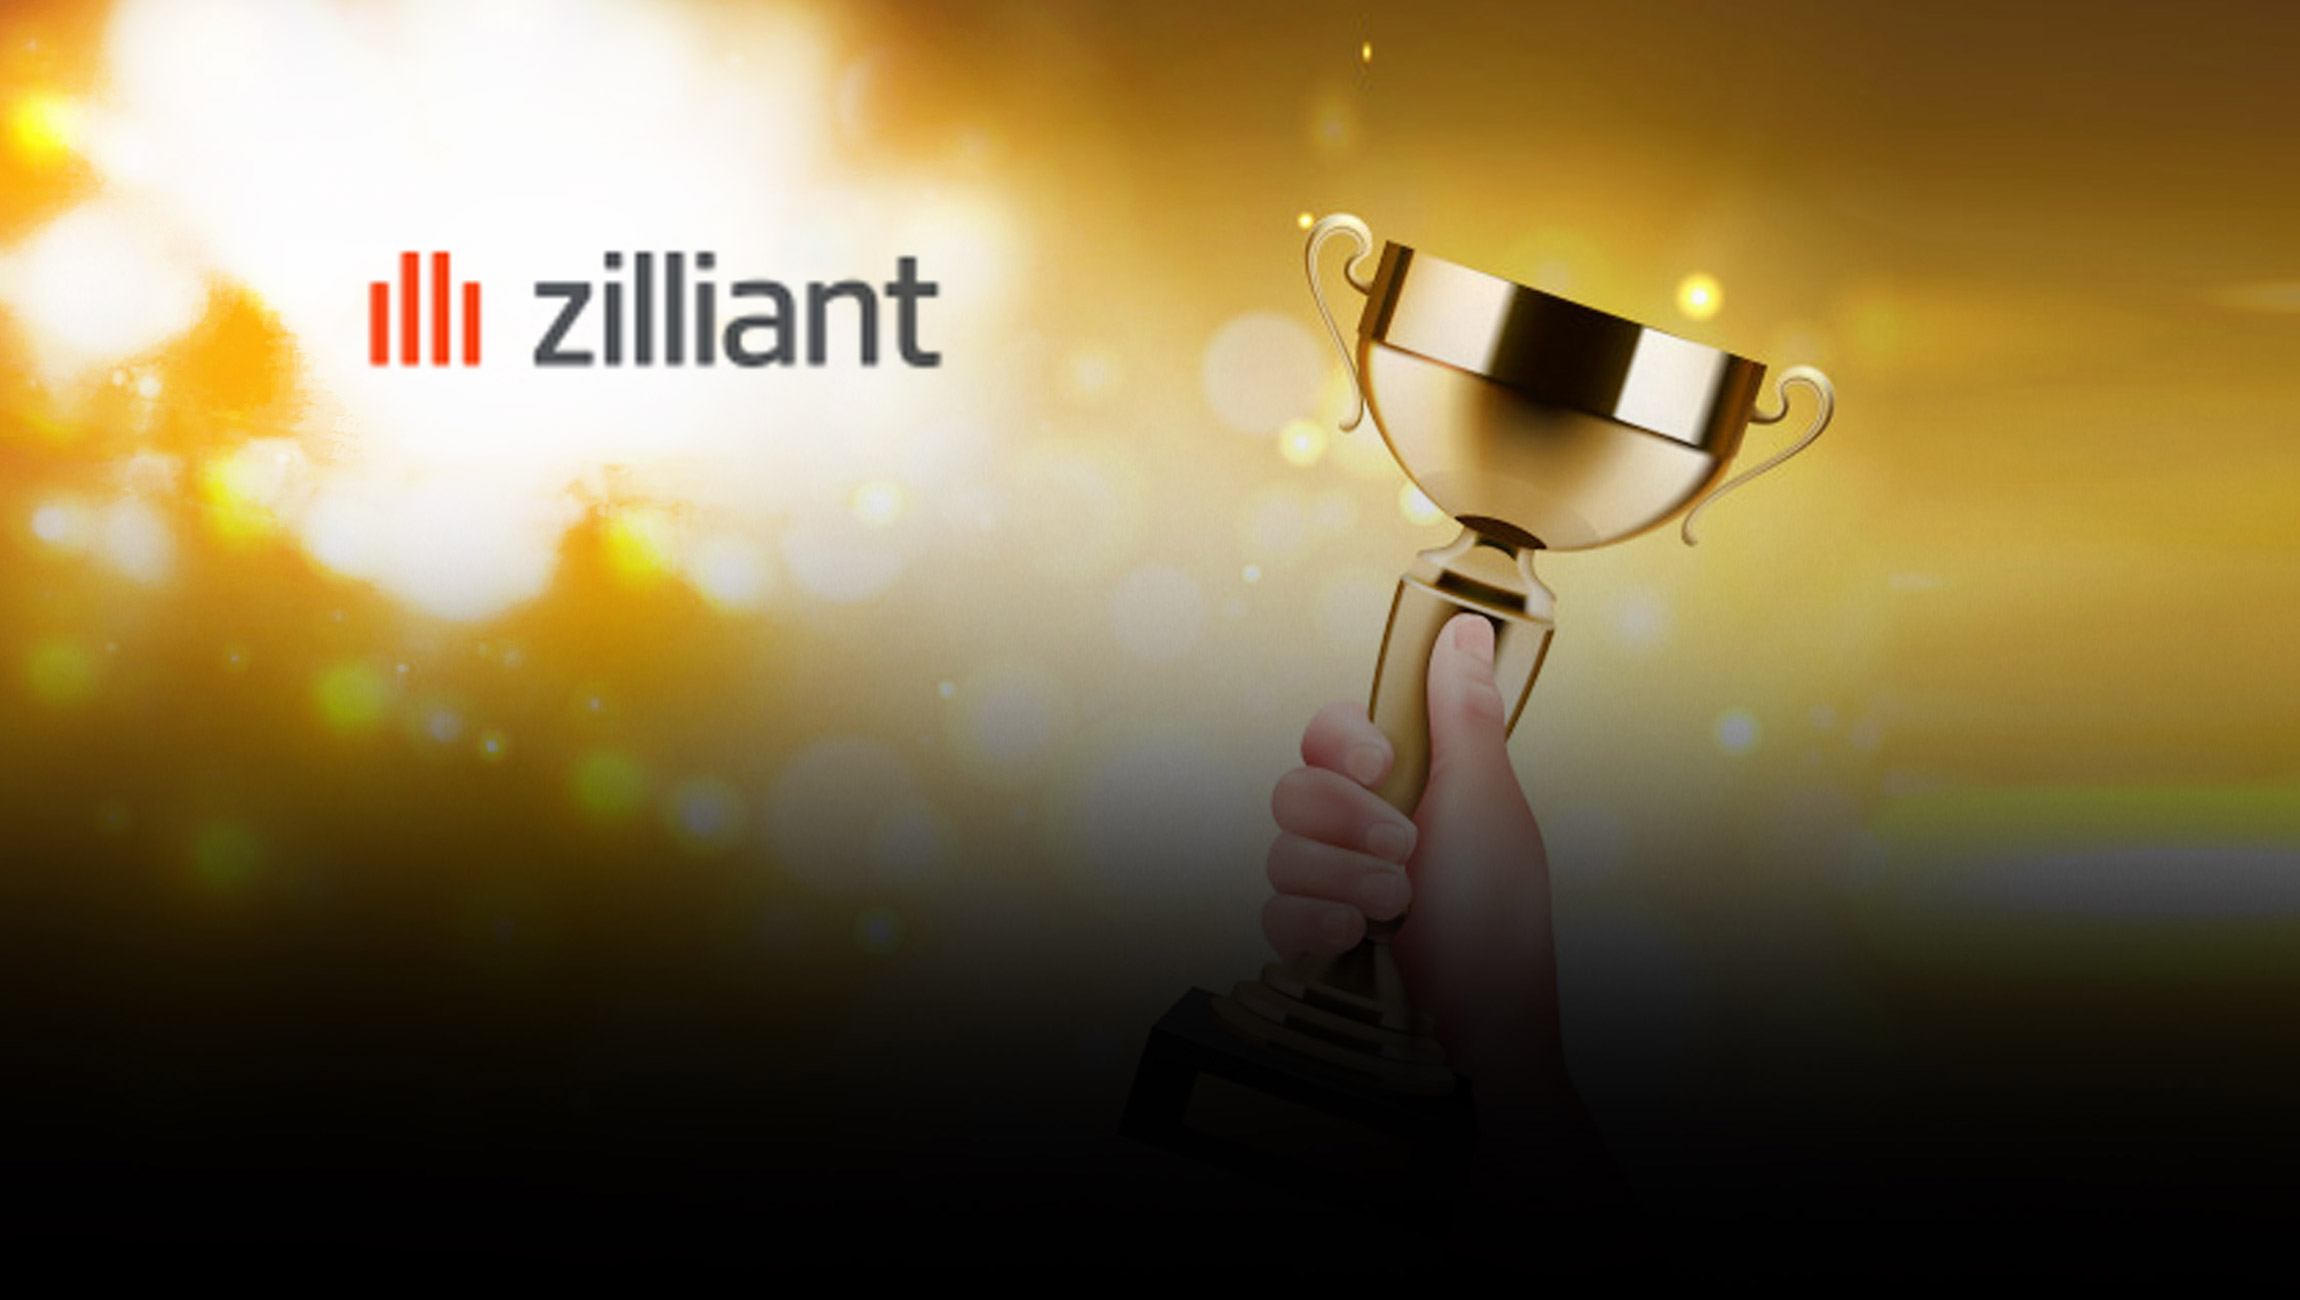 Zilliant-Recognized-for-SalesTech-Innovation-in-2021-MarTech-Breakthrough-Awards-Program